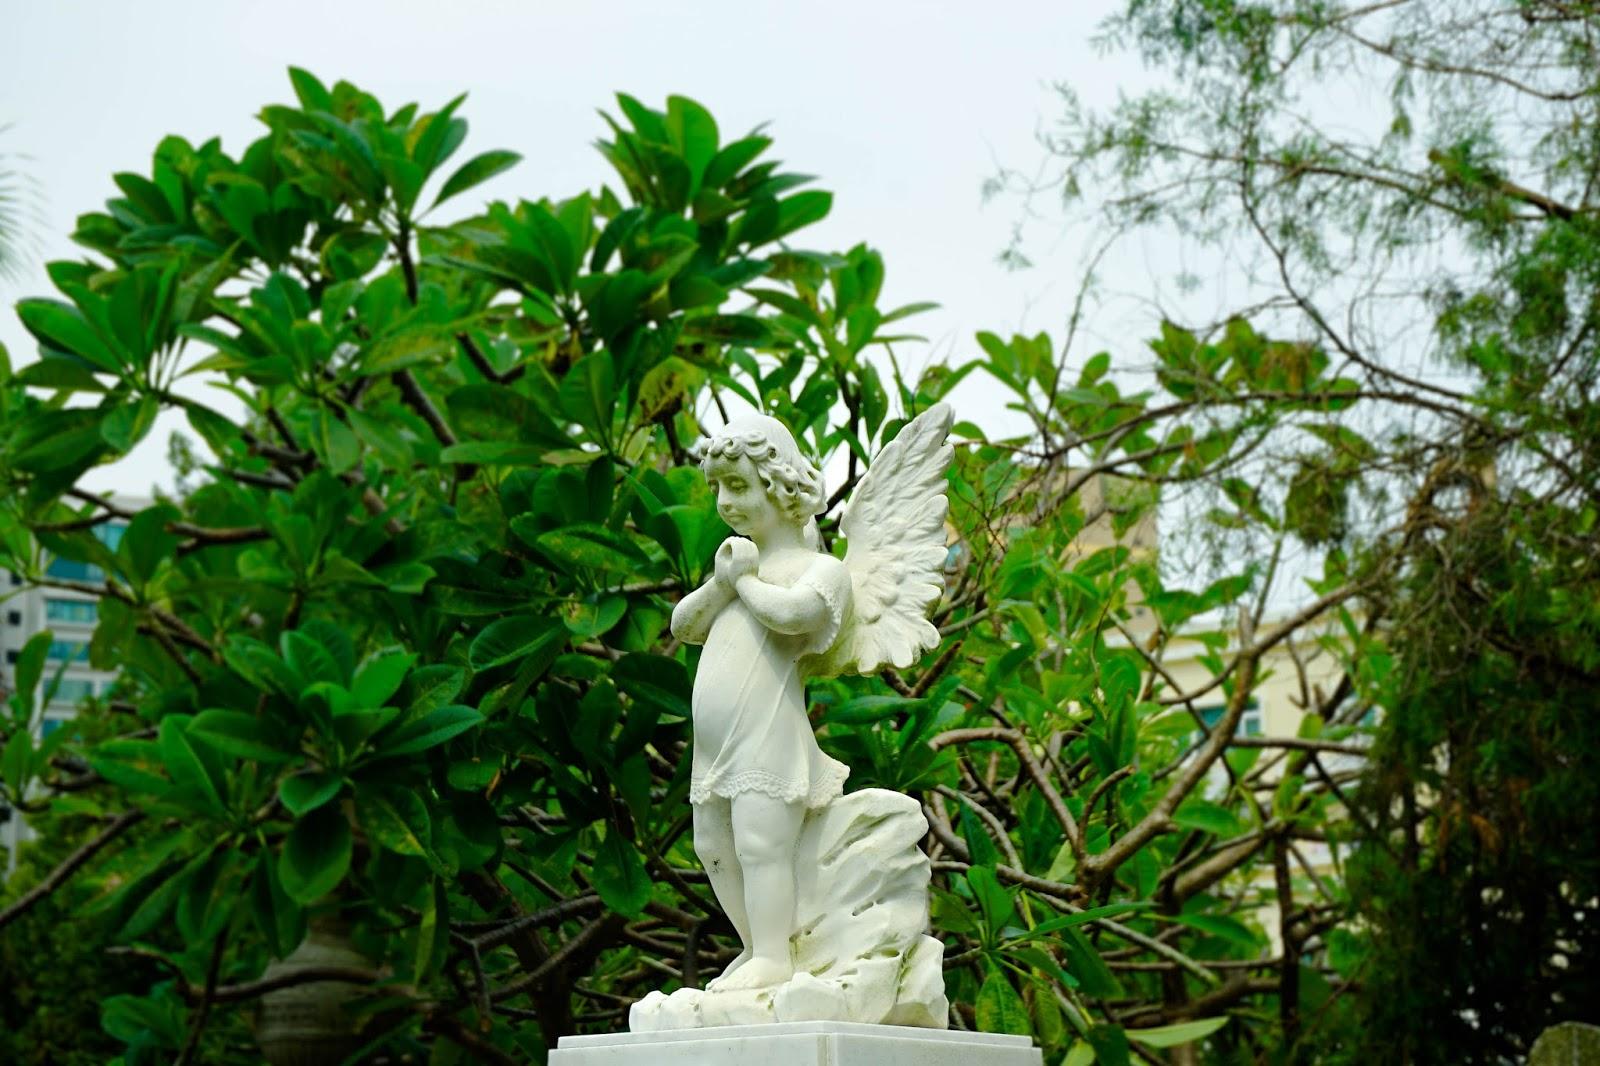 beautyanxiety.com-St. Michael's Chapel and Cemetery-beautyanxiety.com-St.%2BMichael%2527s%2BChapel%2Band%2BCemetery-DSC09840.jpg